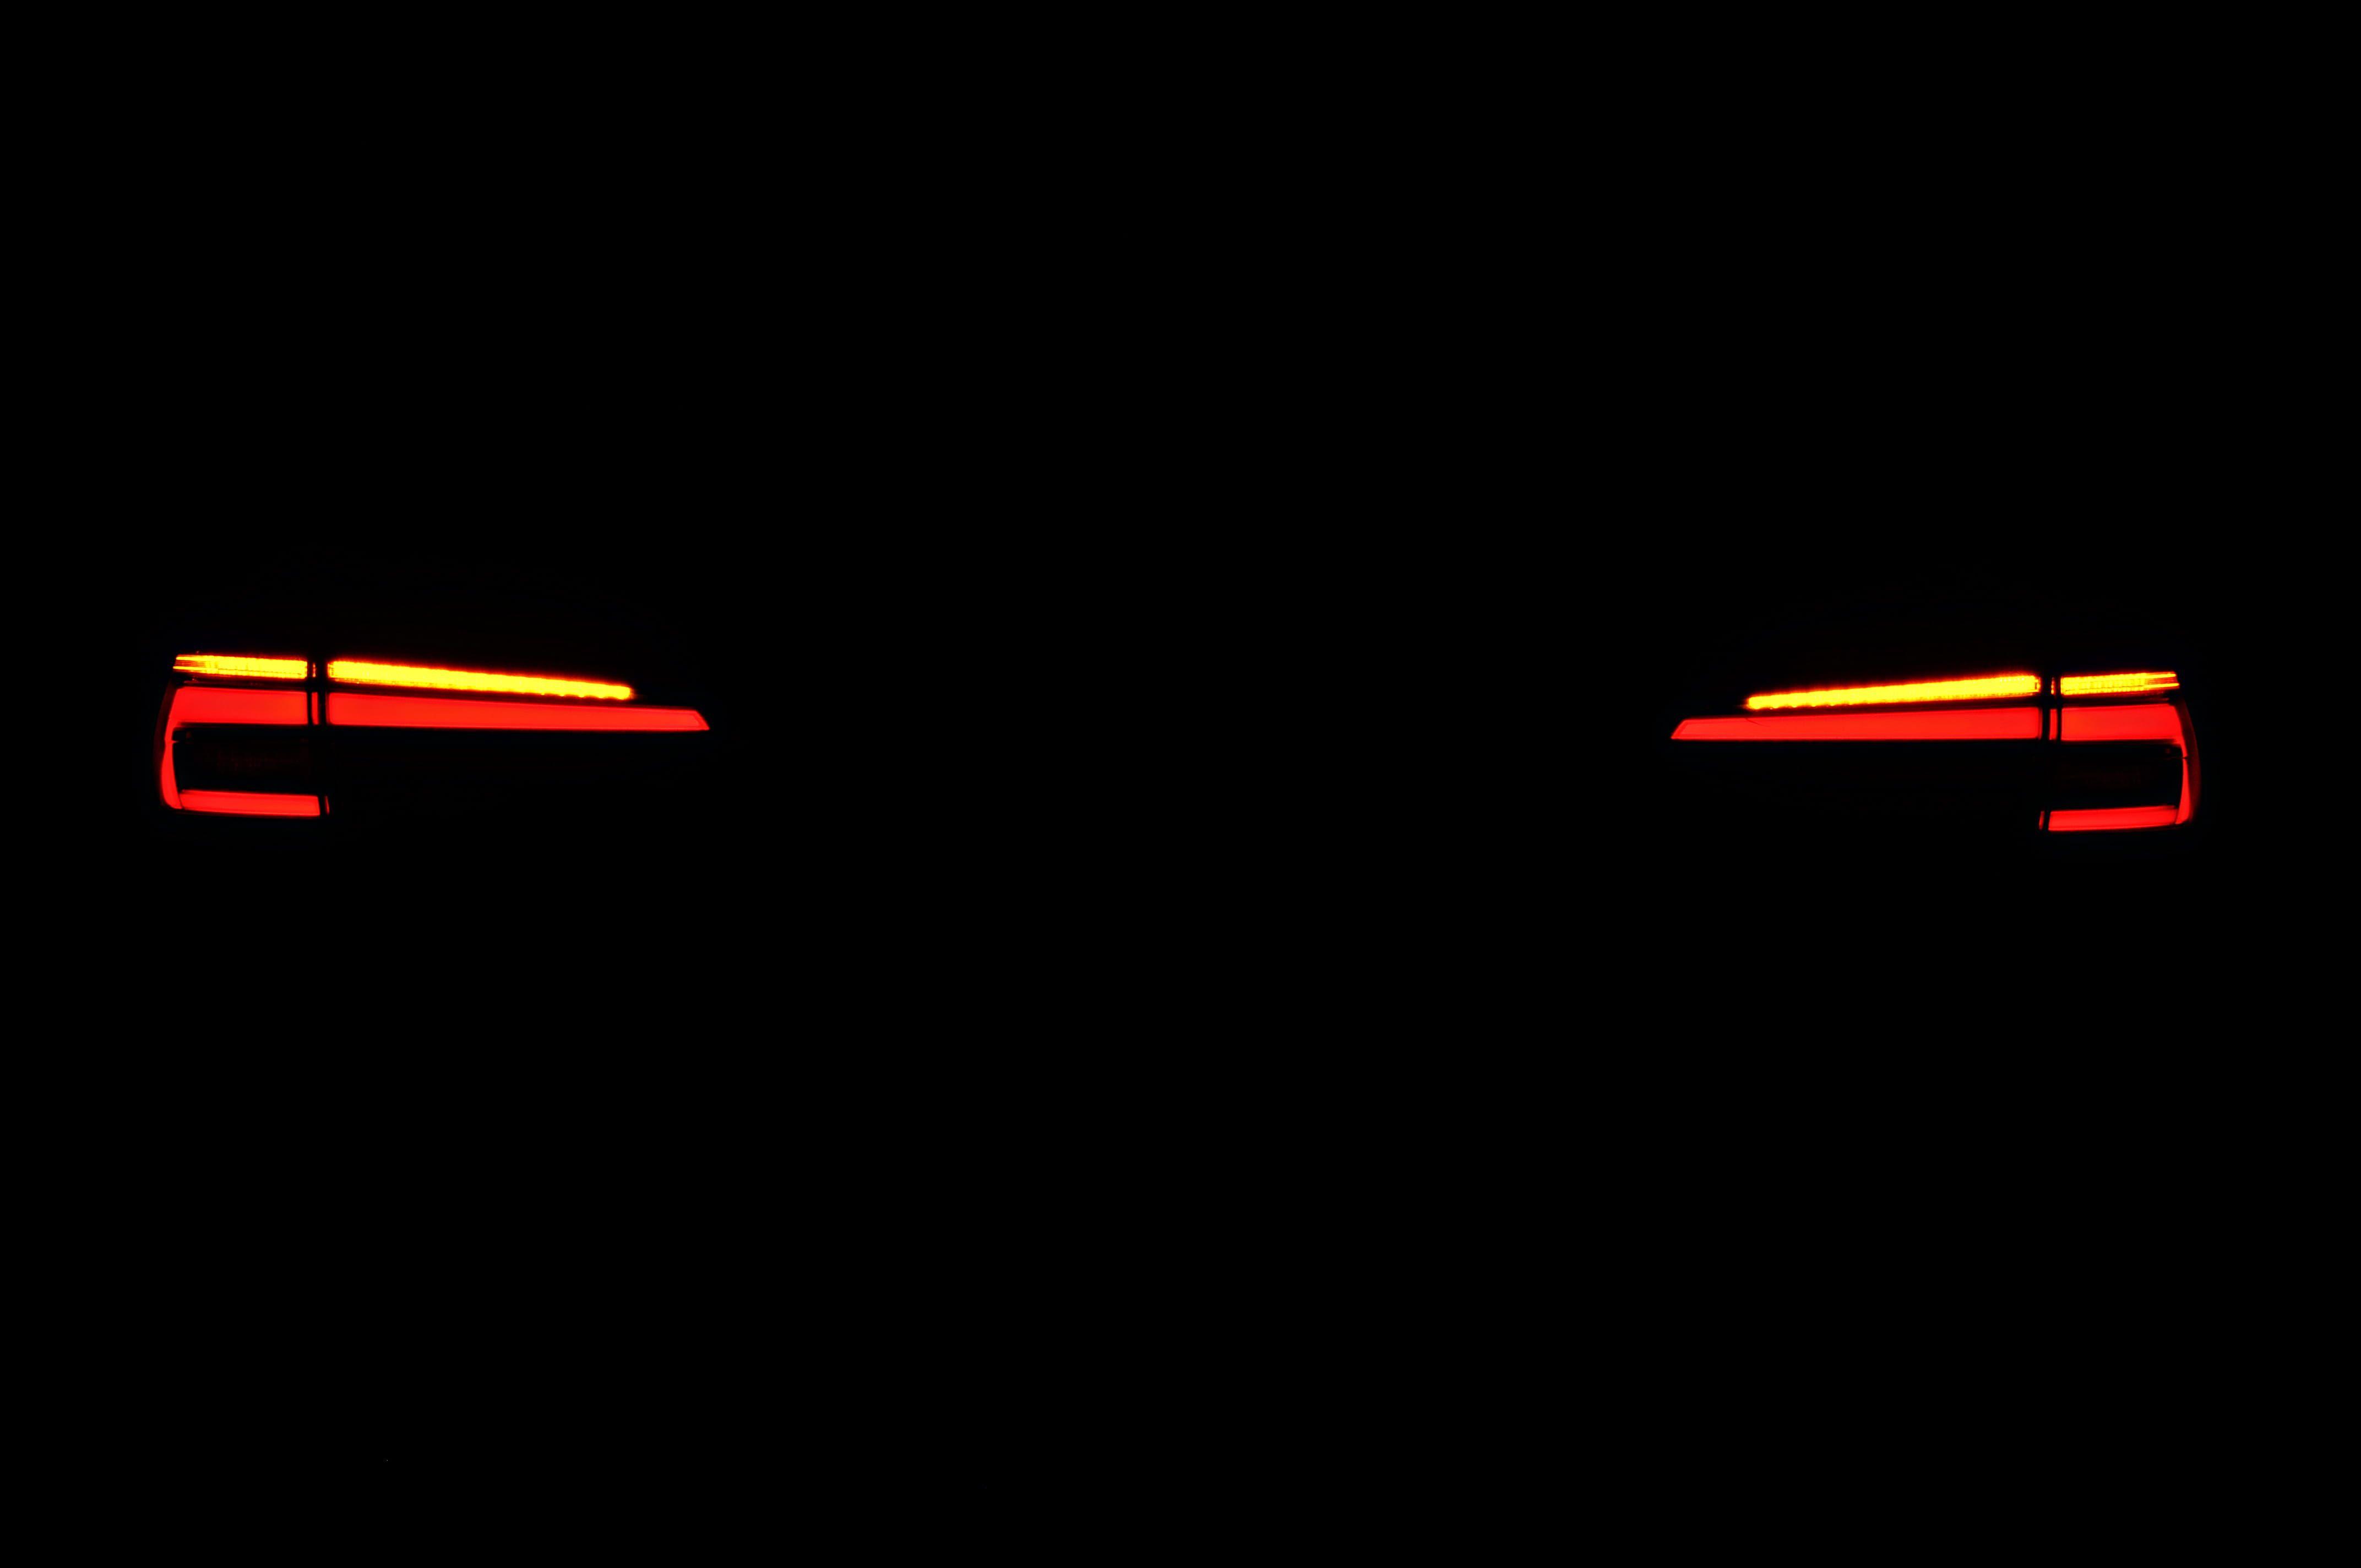 Audi A4 Audia4 A4b9 Taillights Car Carporn Indicator Red Black Night Fast Focus Engeneering German Austria 4k Line Wallpaper Audi Hd Wallpaper